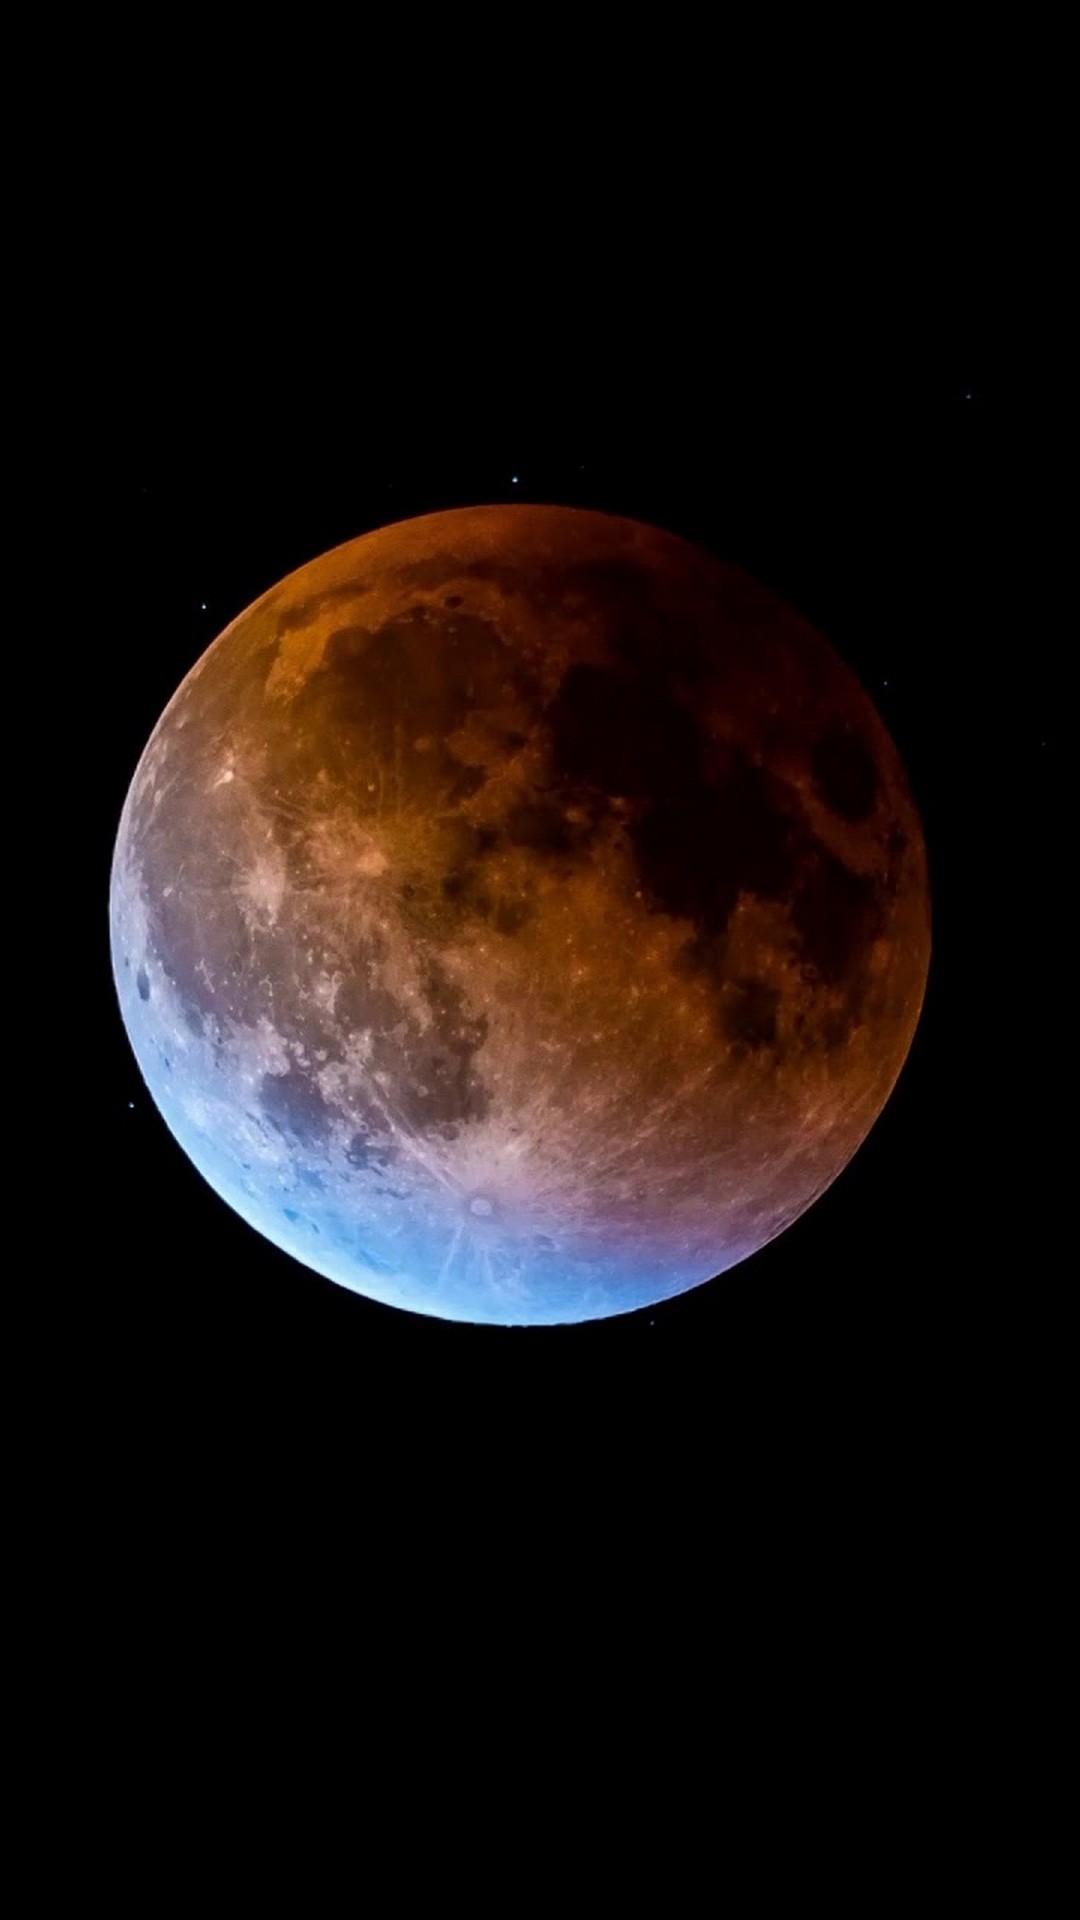 iPhone Wallpaper Super Blue Blood Moon 2019 3D iPhone Wallpaper 1080x1920